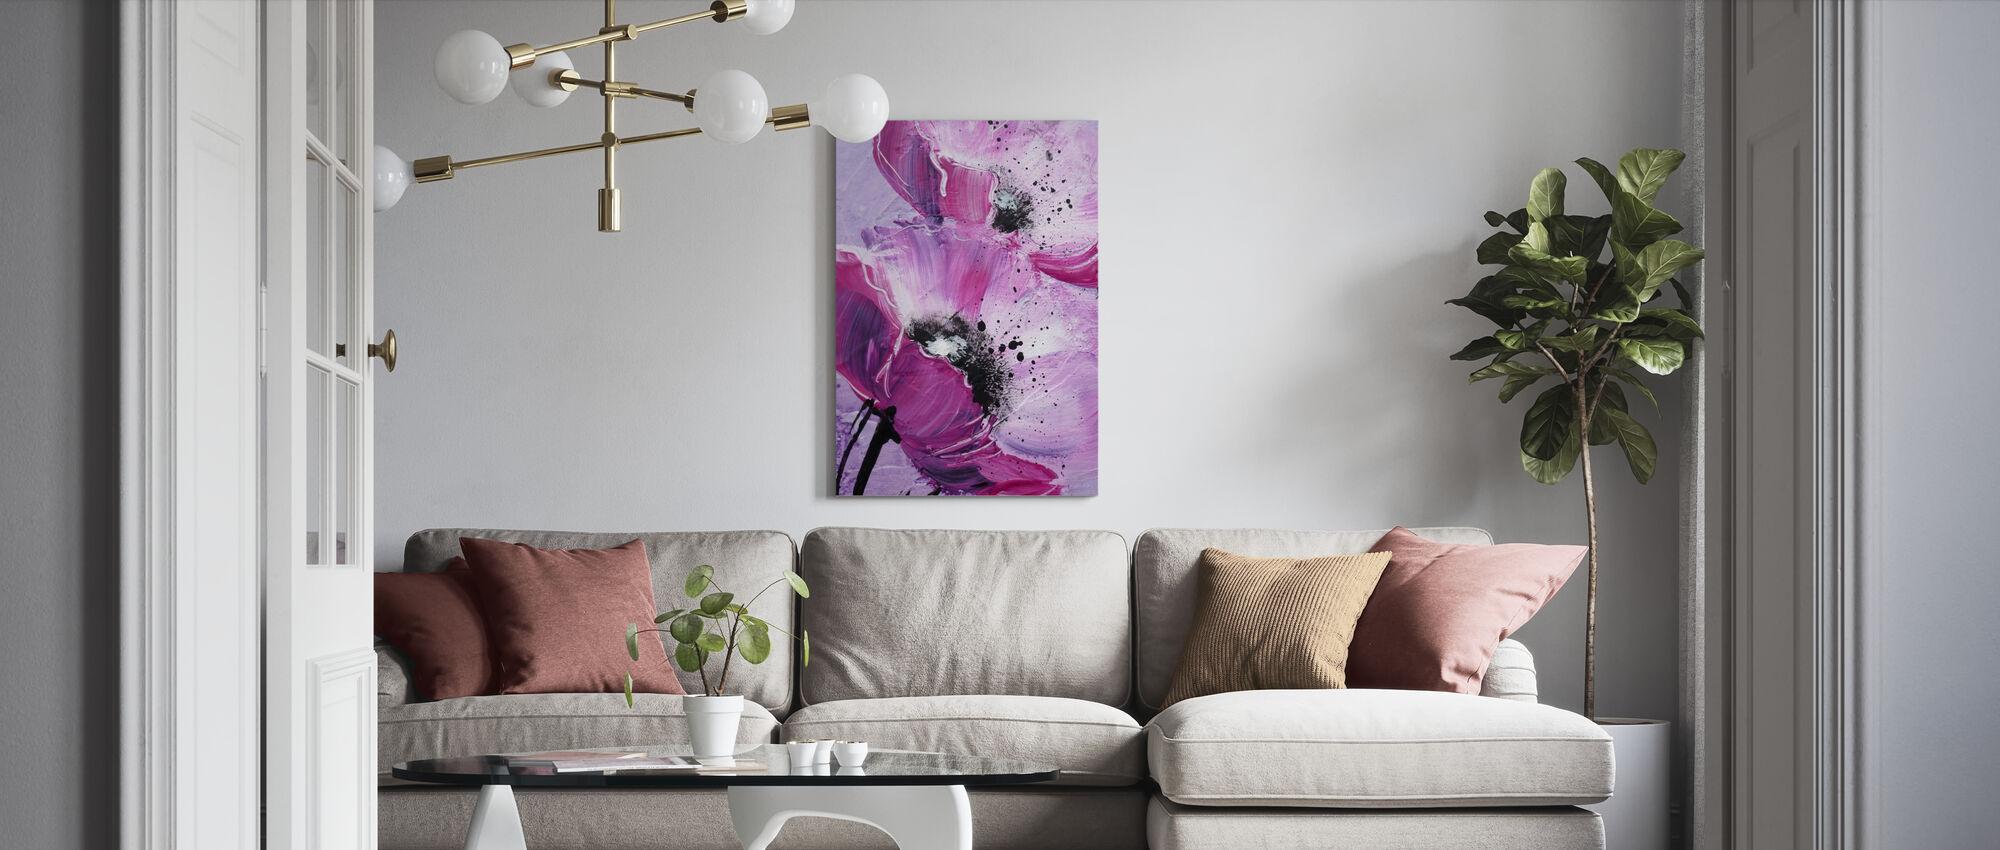 Violet Poppy Harmony - Canvas print - Living Room